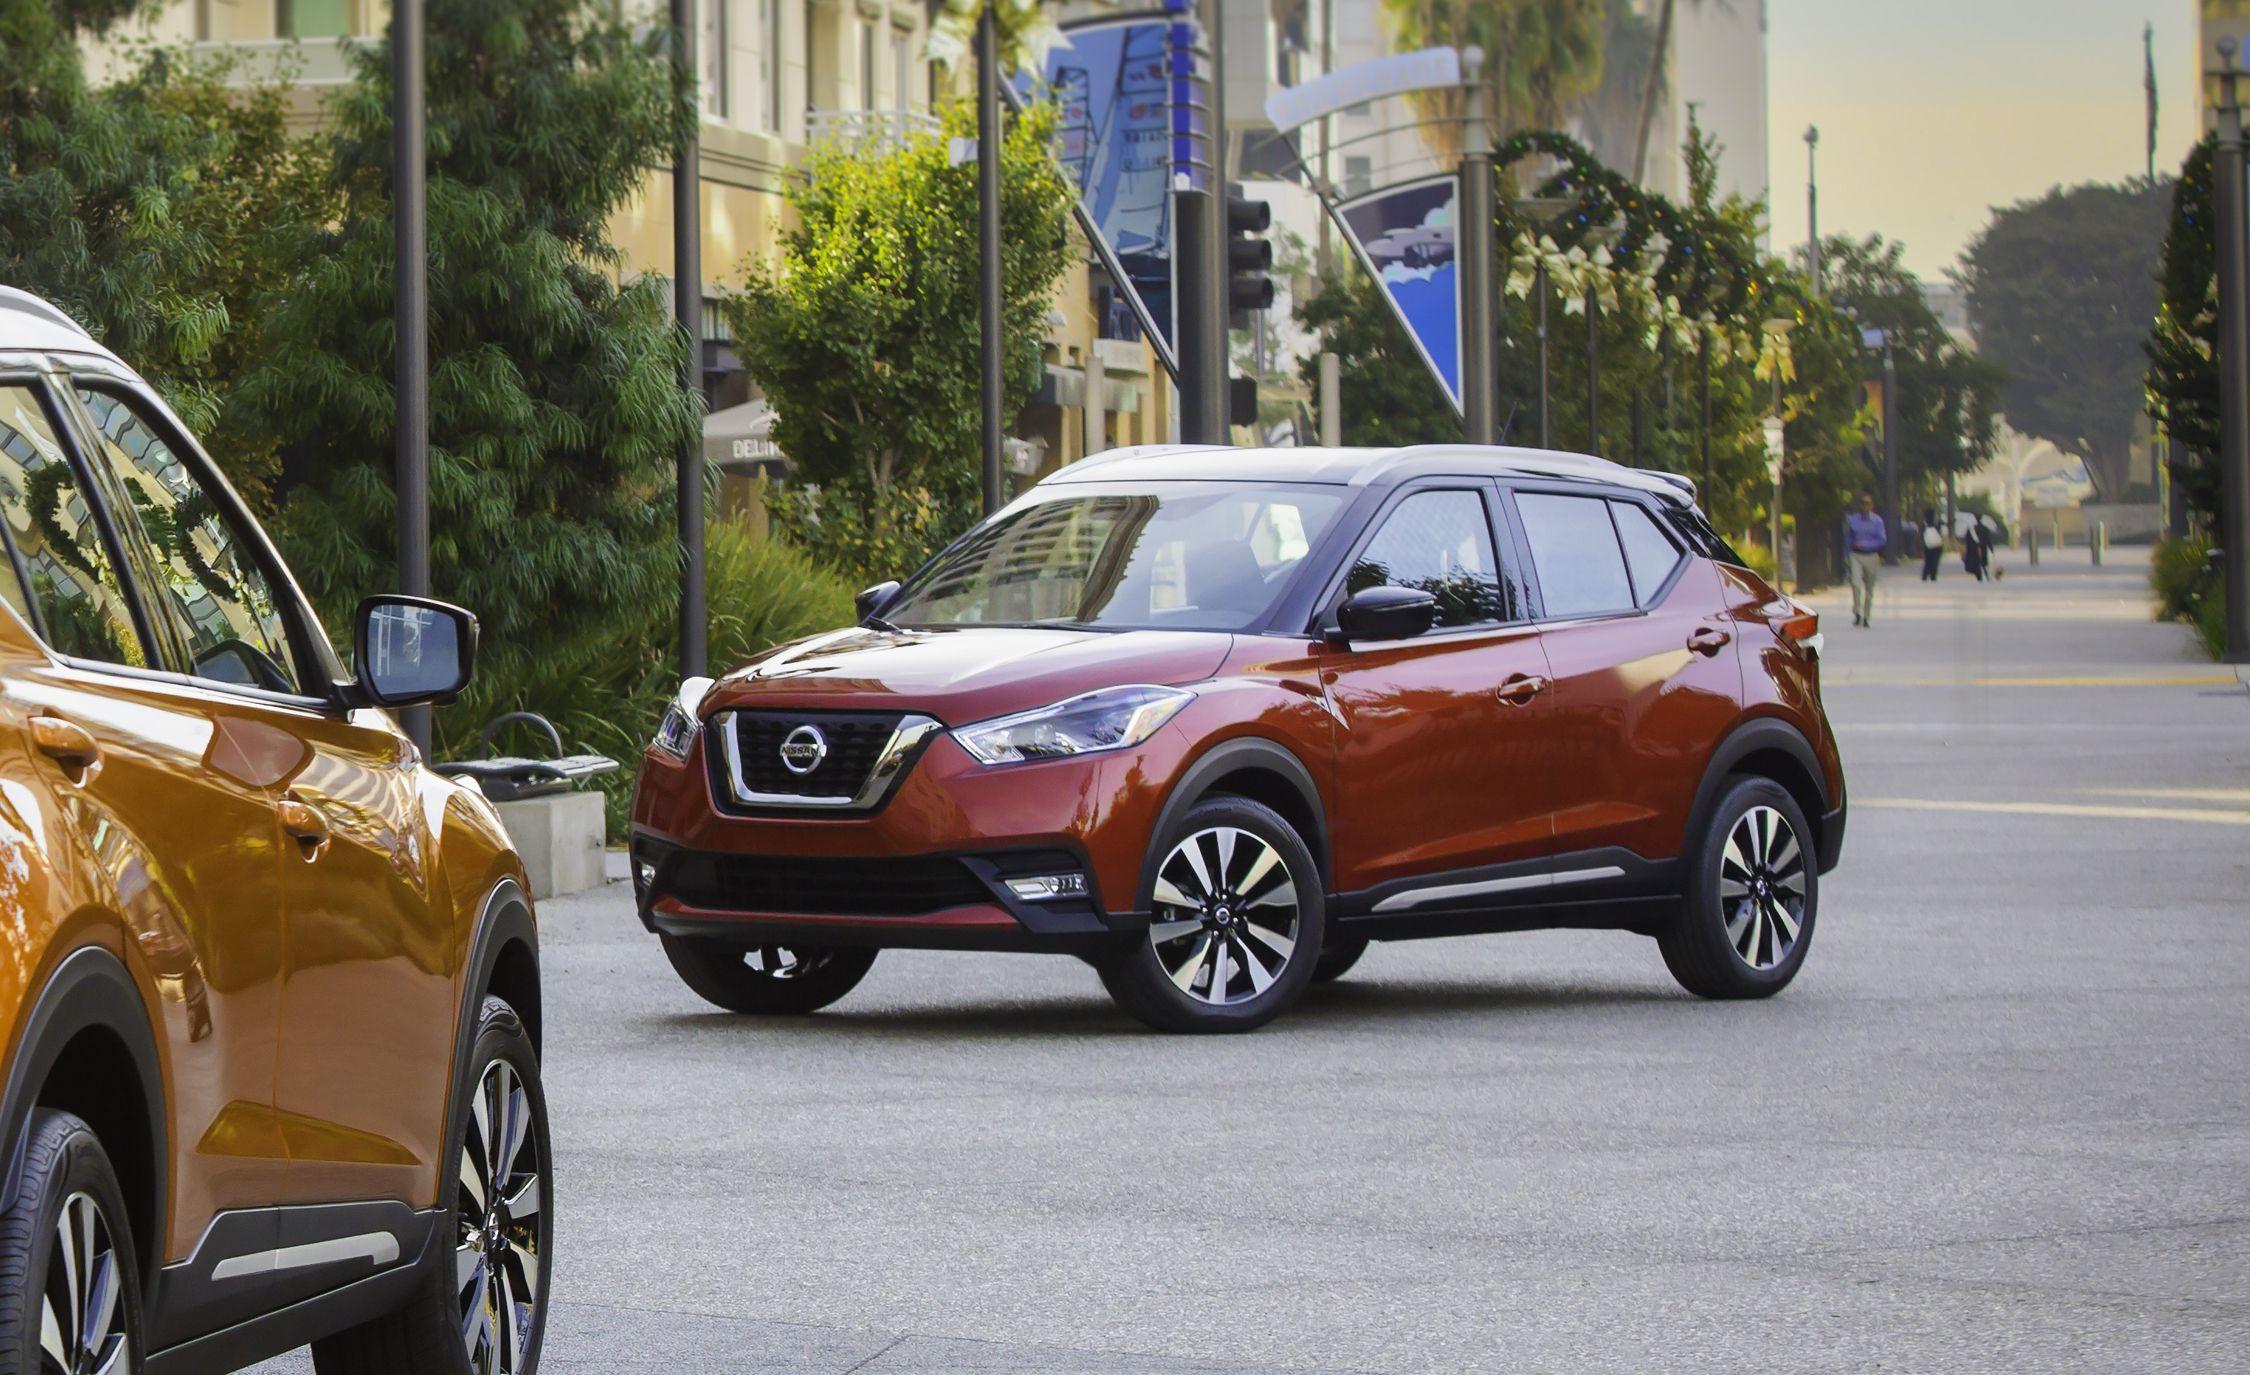 2019 Nissan Kicks Reviews Nissan Kicks Price Photos And Specs